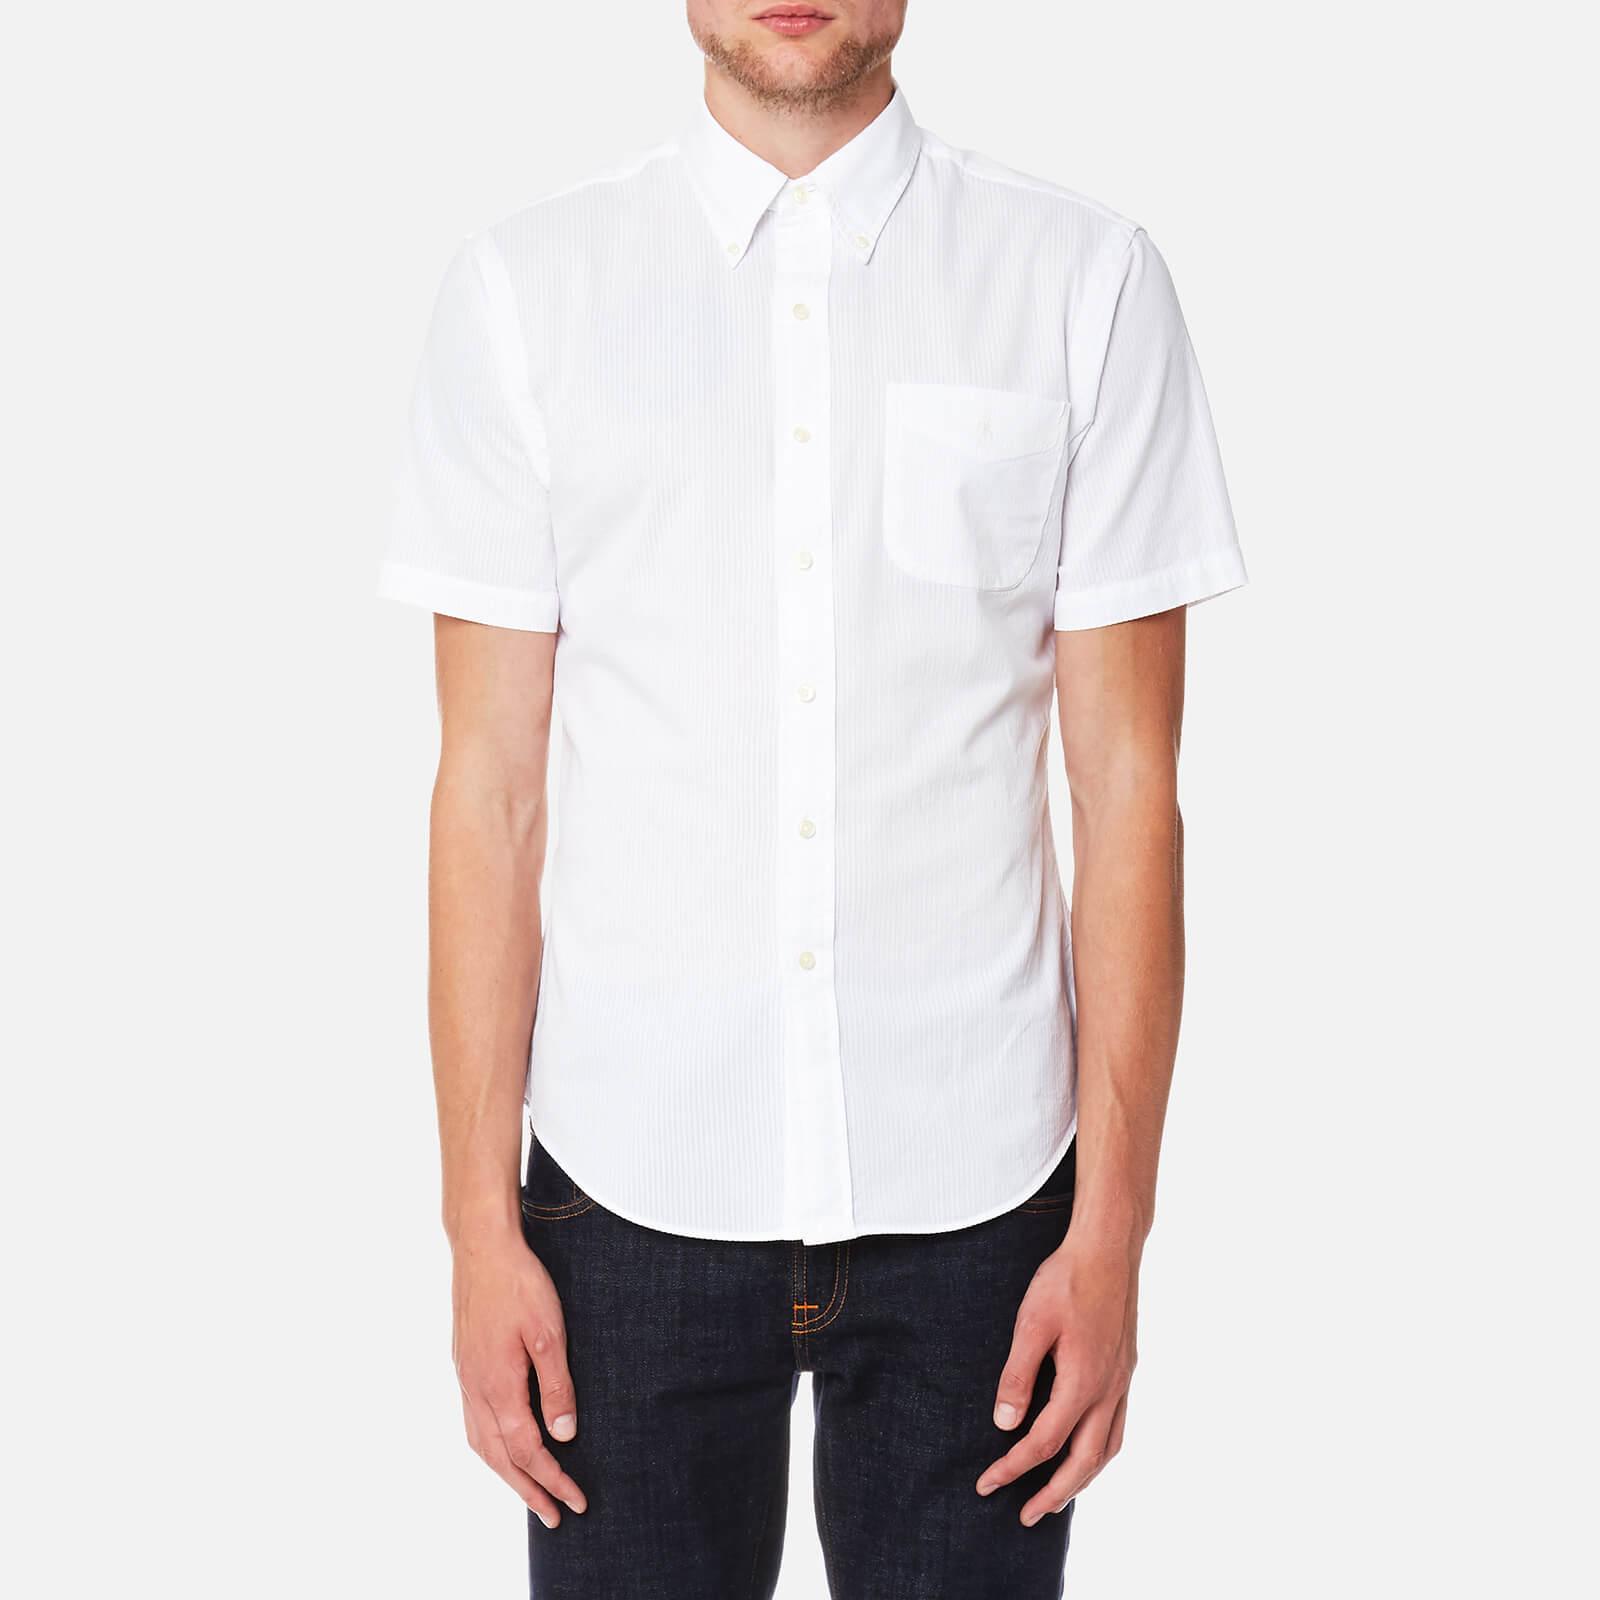 e12c76051 Polo Ralph Lauren Men s Seersucker Short Sleeve Sport Shirt - White - Free  UK Delivery over £50